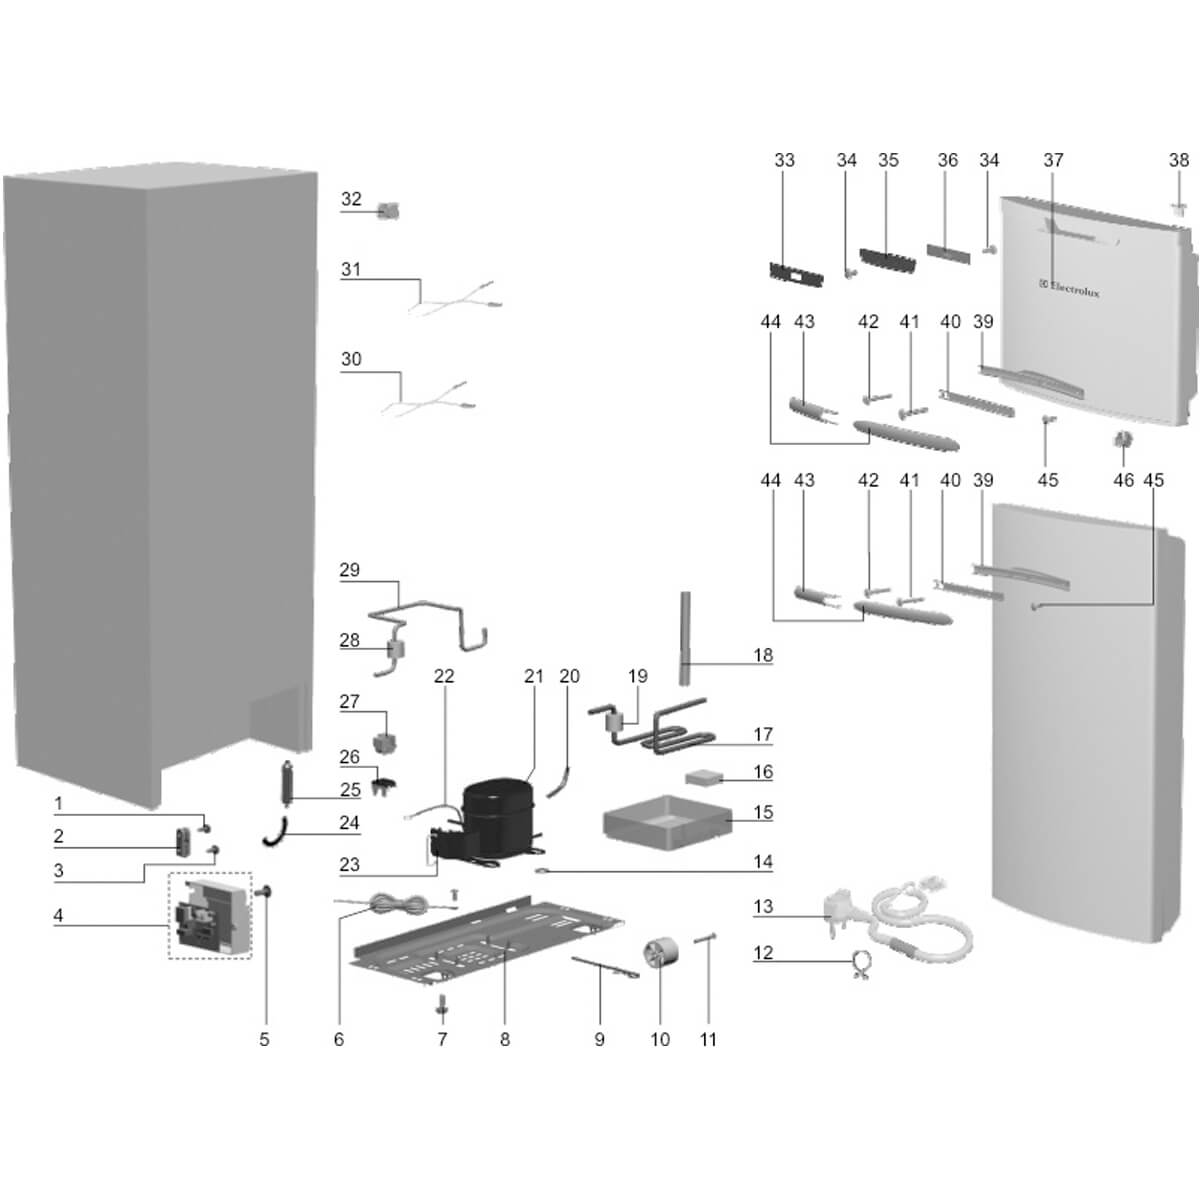 Rede Sensor De Degelo Para Refrigerador Frost Free DFF37 Electrolux  - 70288465